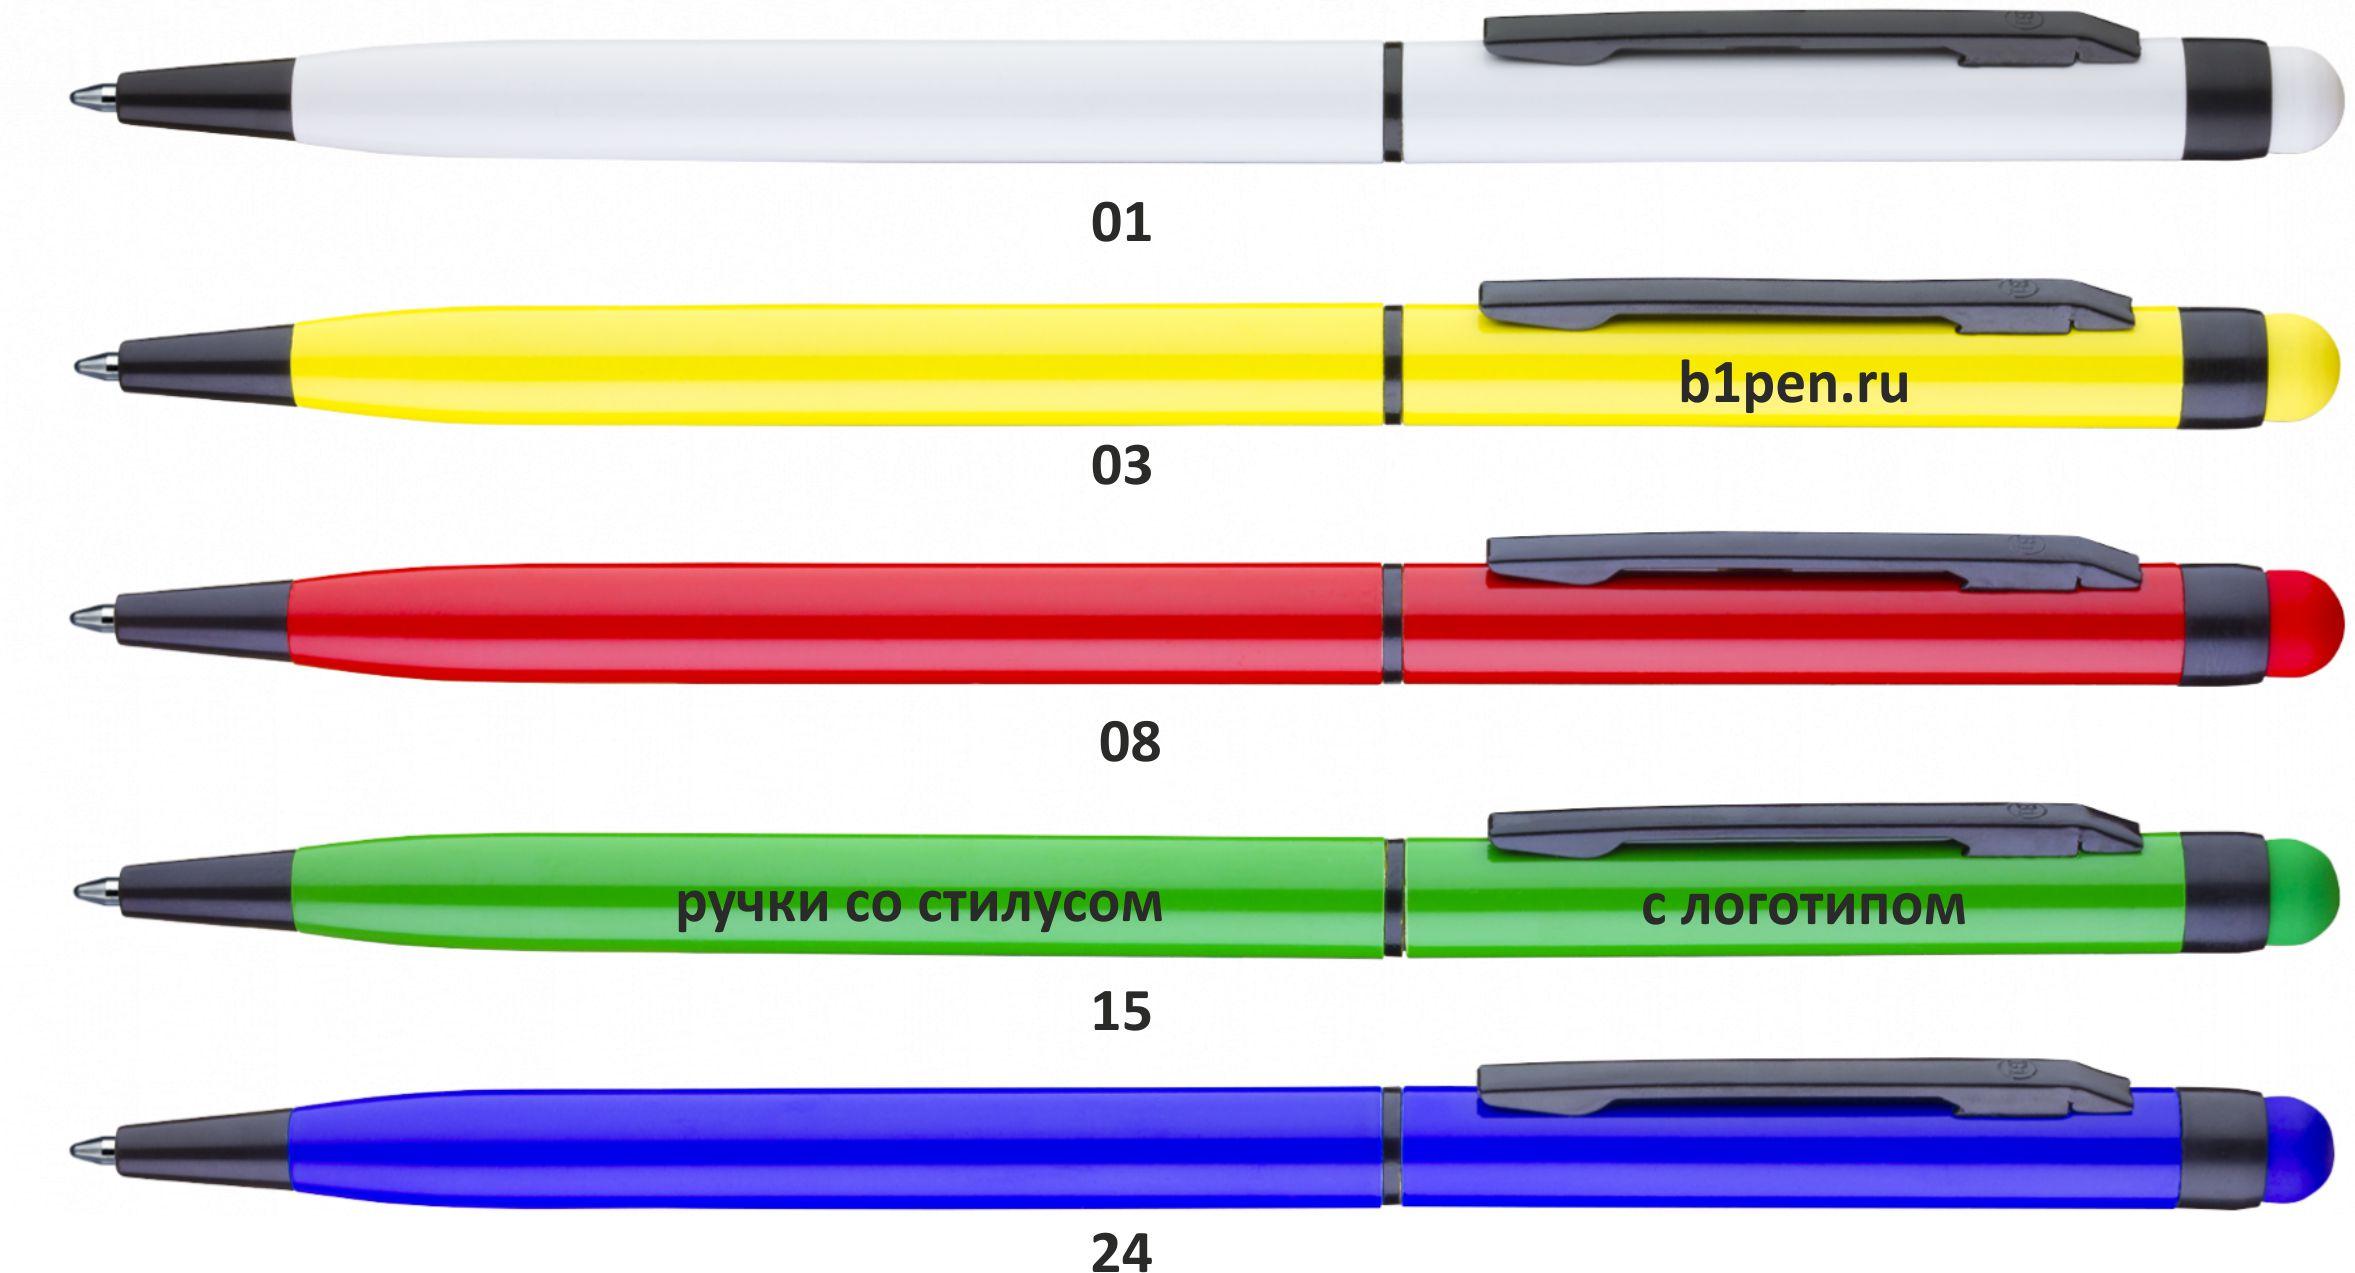 ручки со стилусом тач врайтер